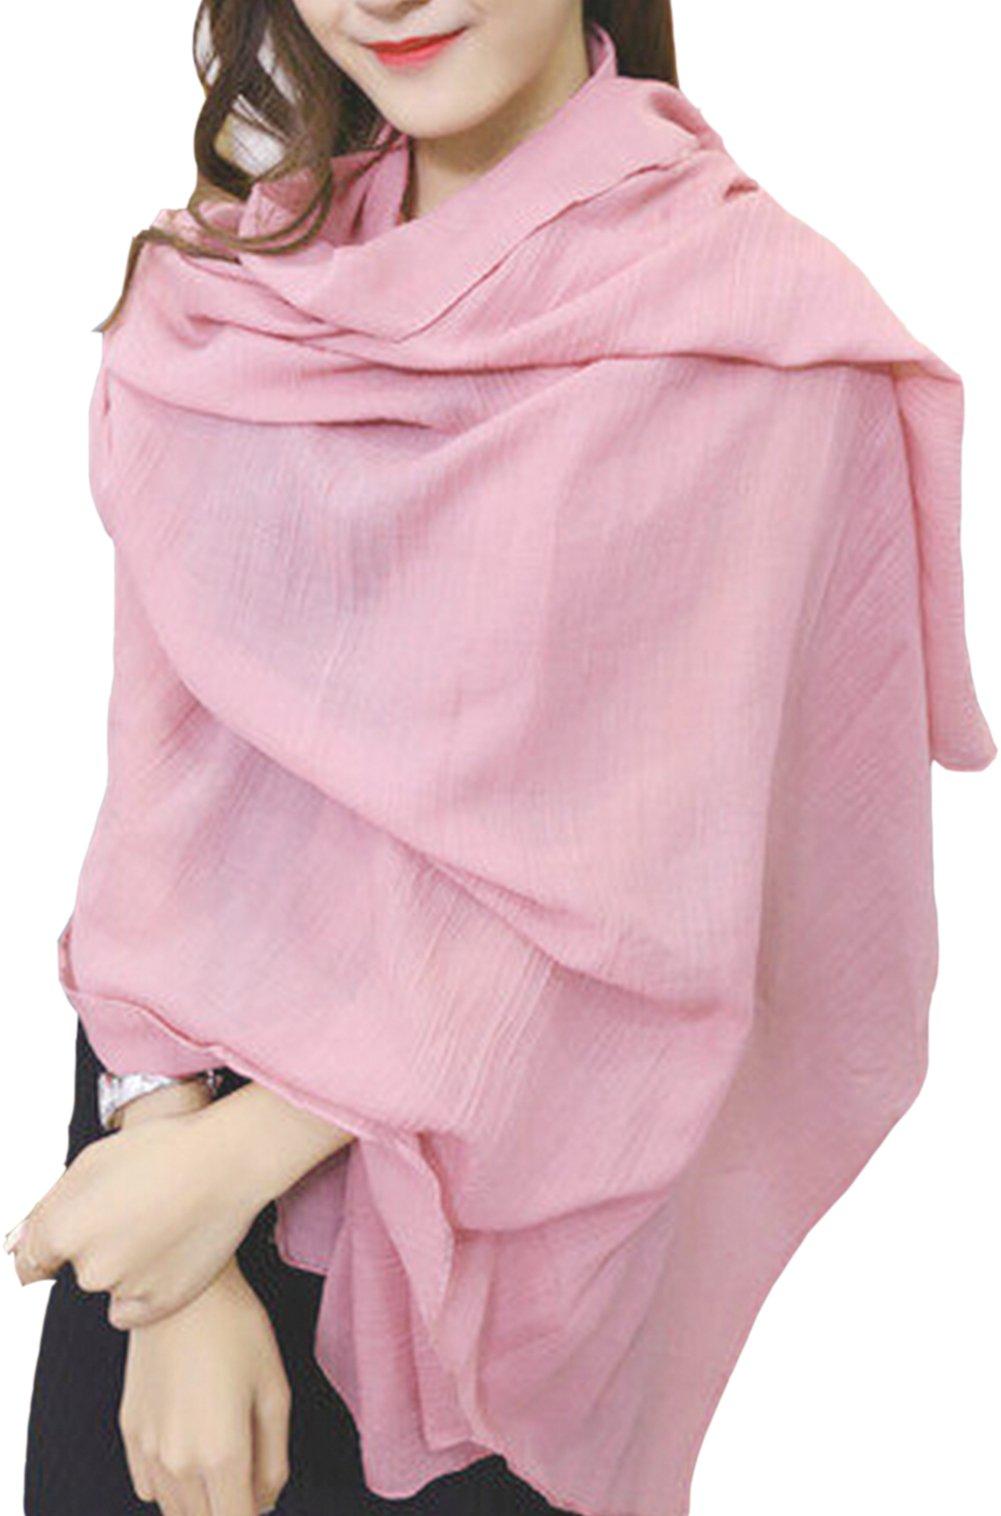 Warmword 78'' 64'' Oversized Solid Cotton&Linen Scarfs Wraps Women 16 Colors (14)